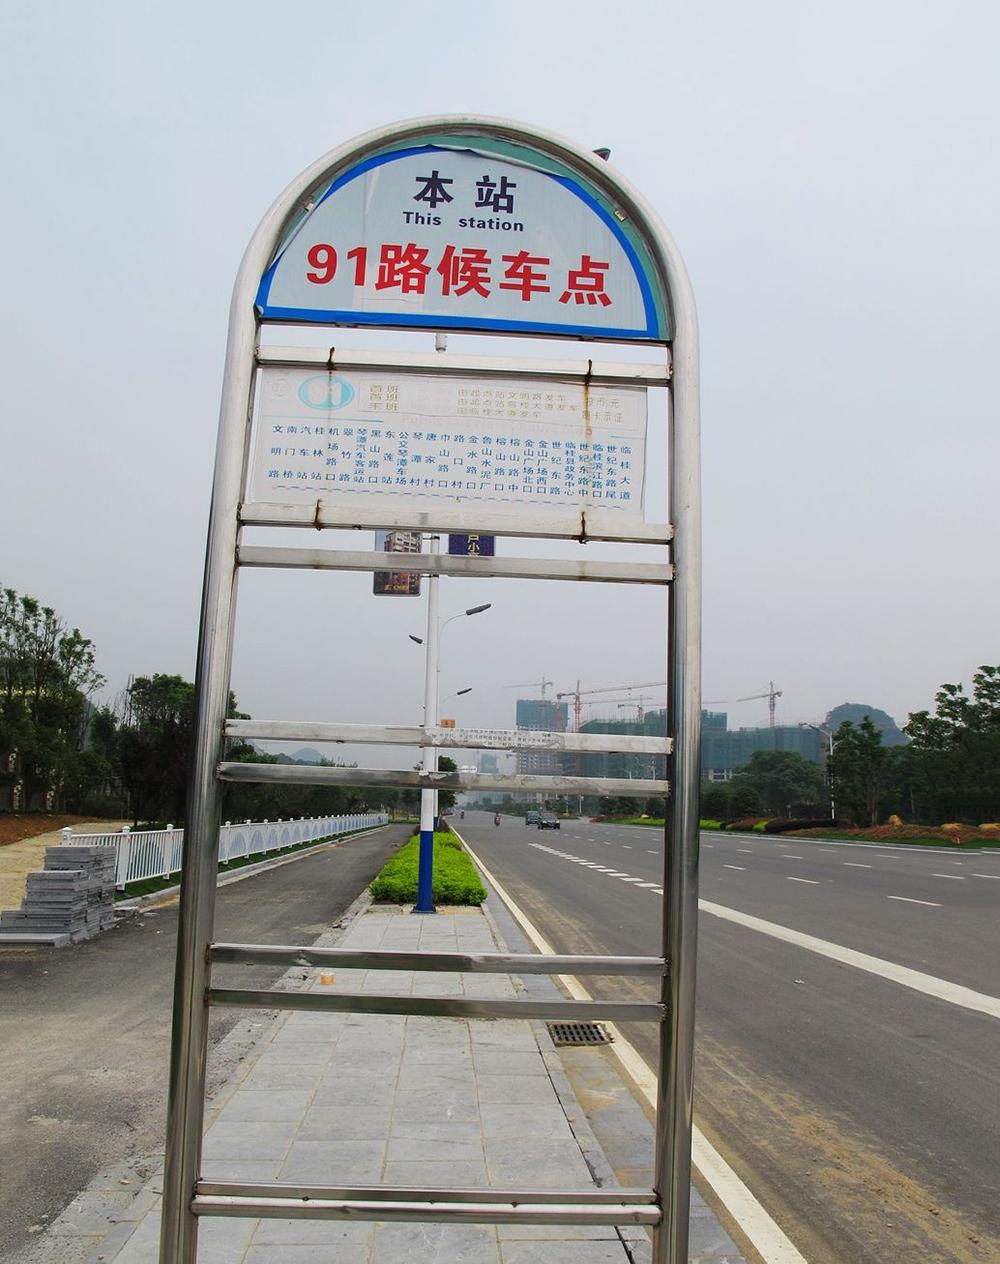 http://yuefangwangimg.oss-cn-hangzhou.aliyuncs.com/uploads/20191216/28a3df34e9f335ab0fe2d35f7b501e05Max.jpg